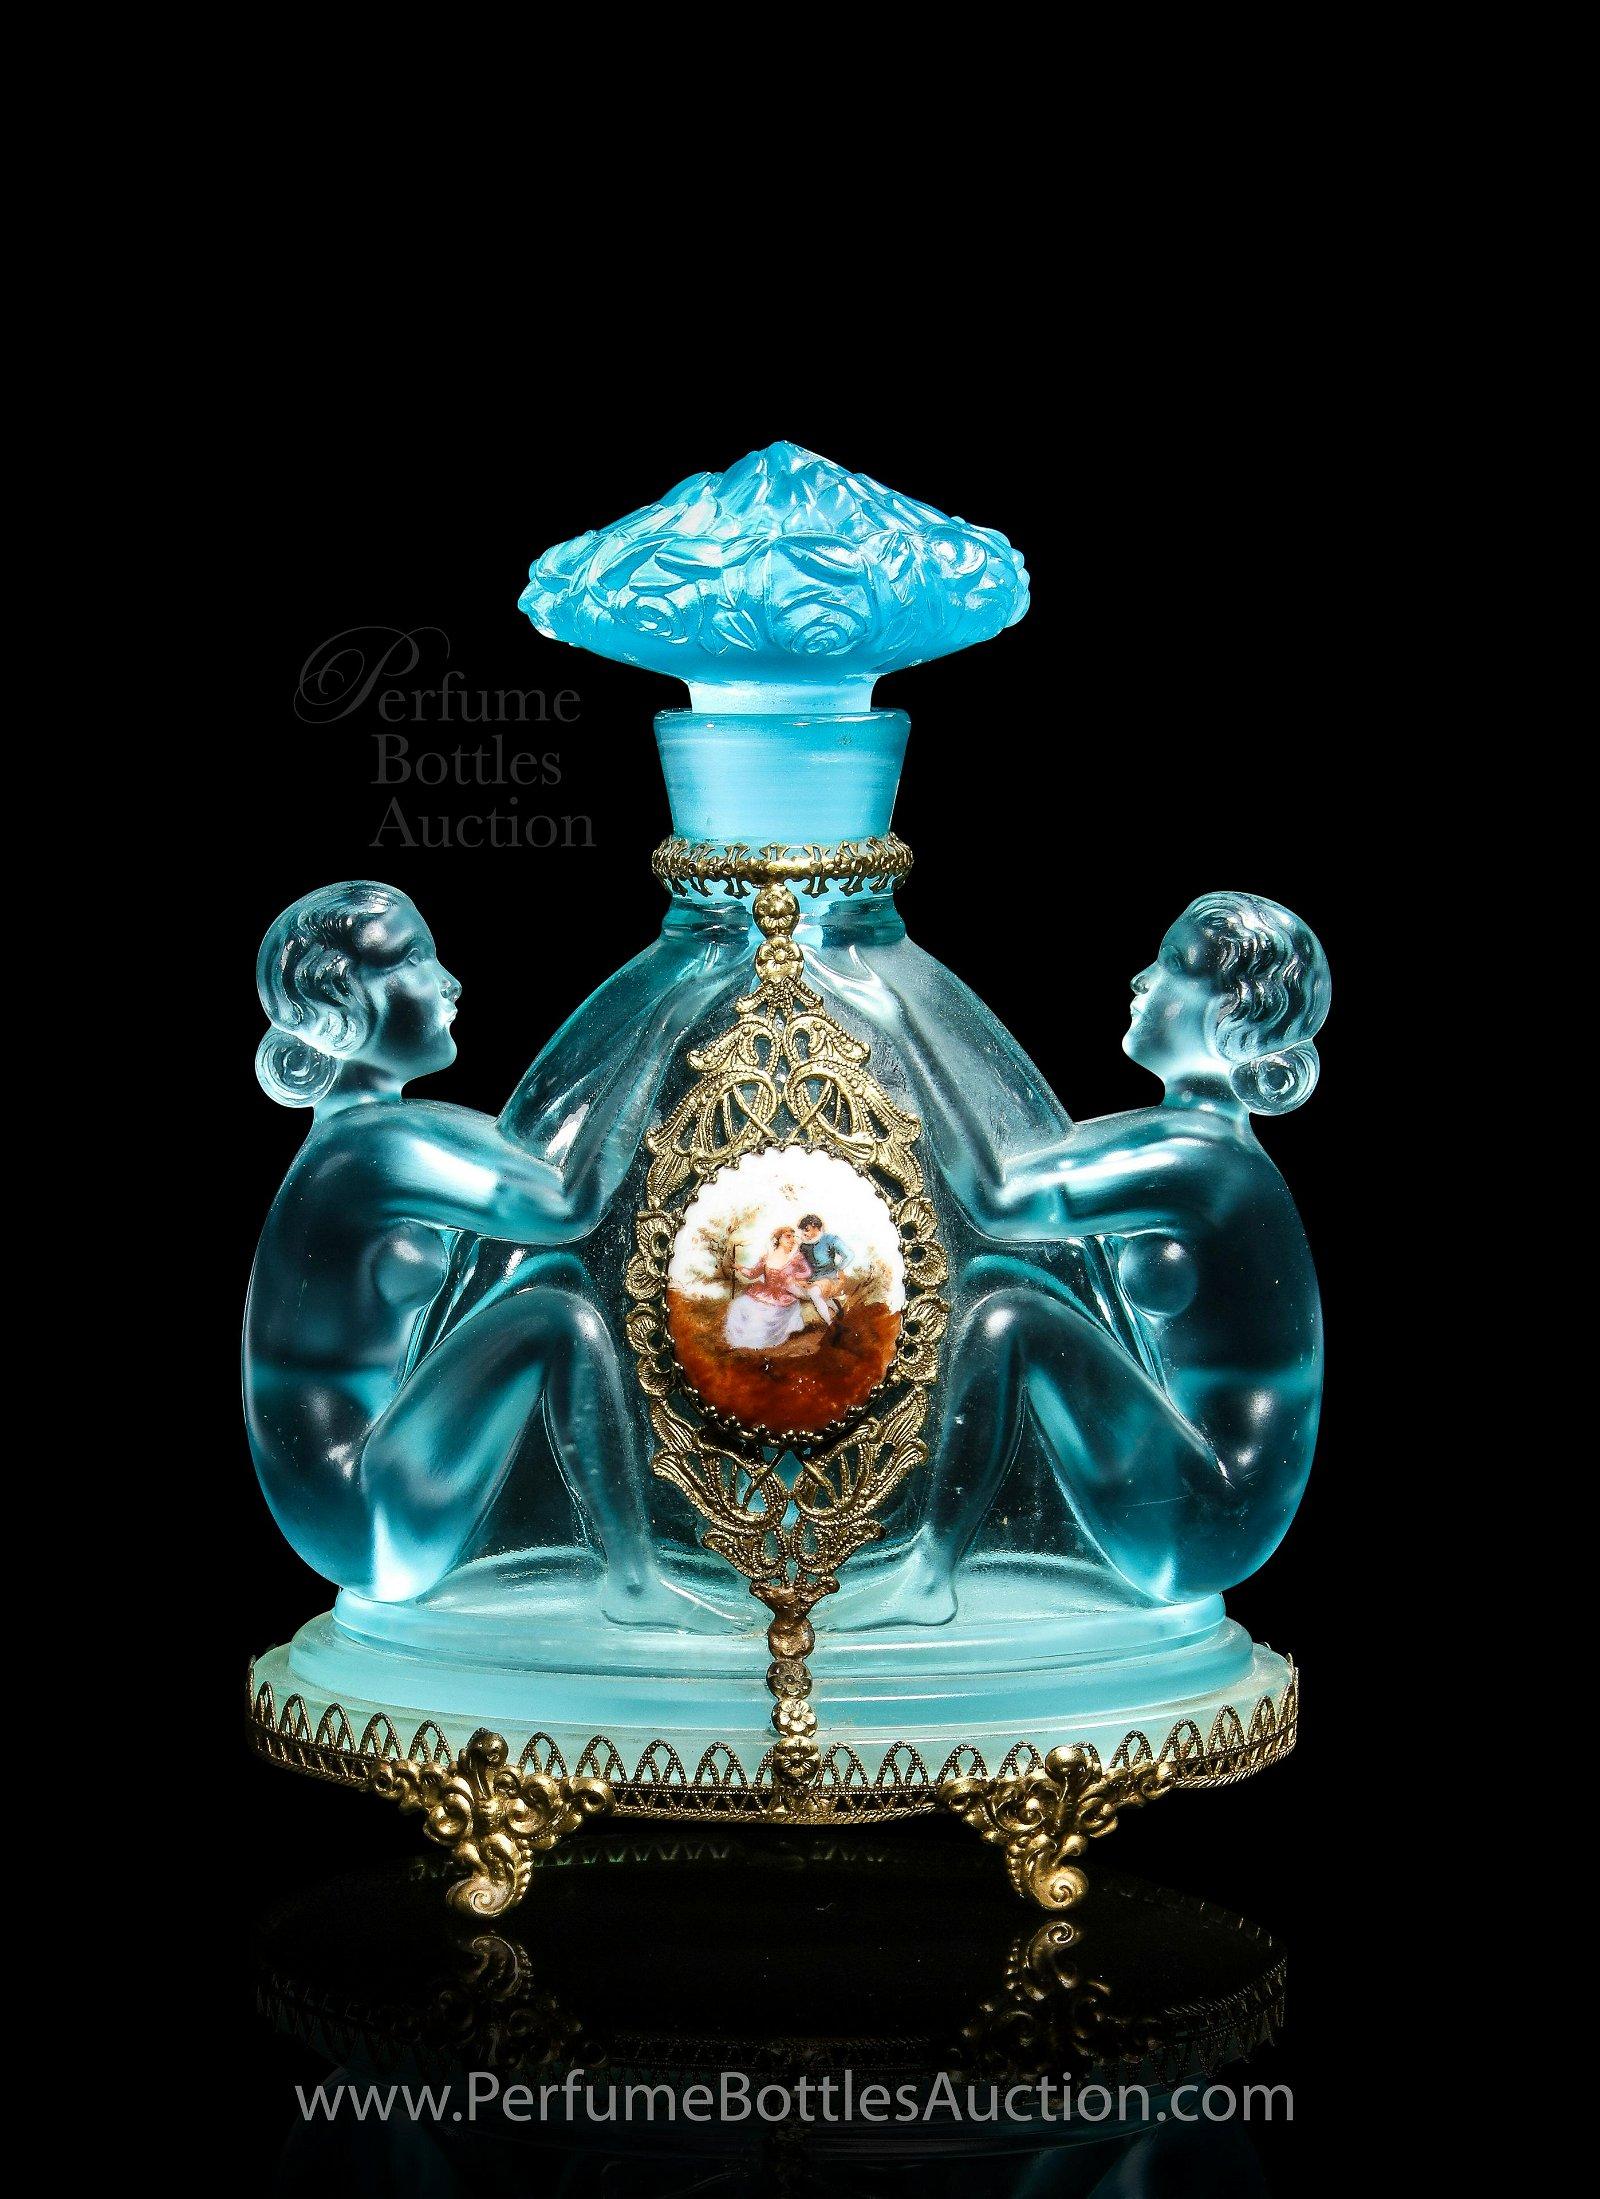 c1930 Czechoslovakian, Josef Inwald art deco perfume